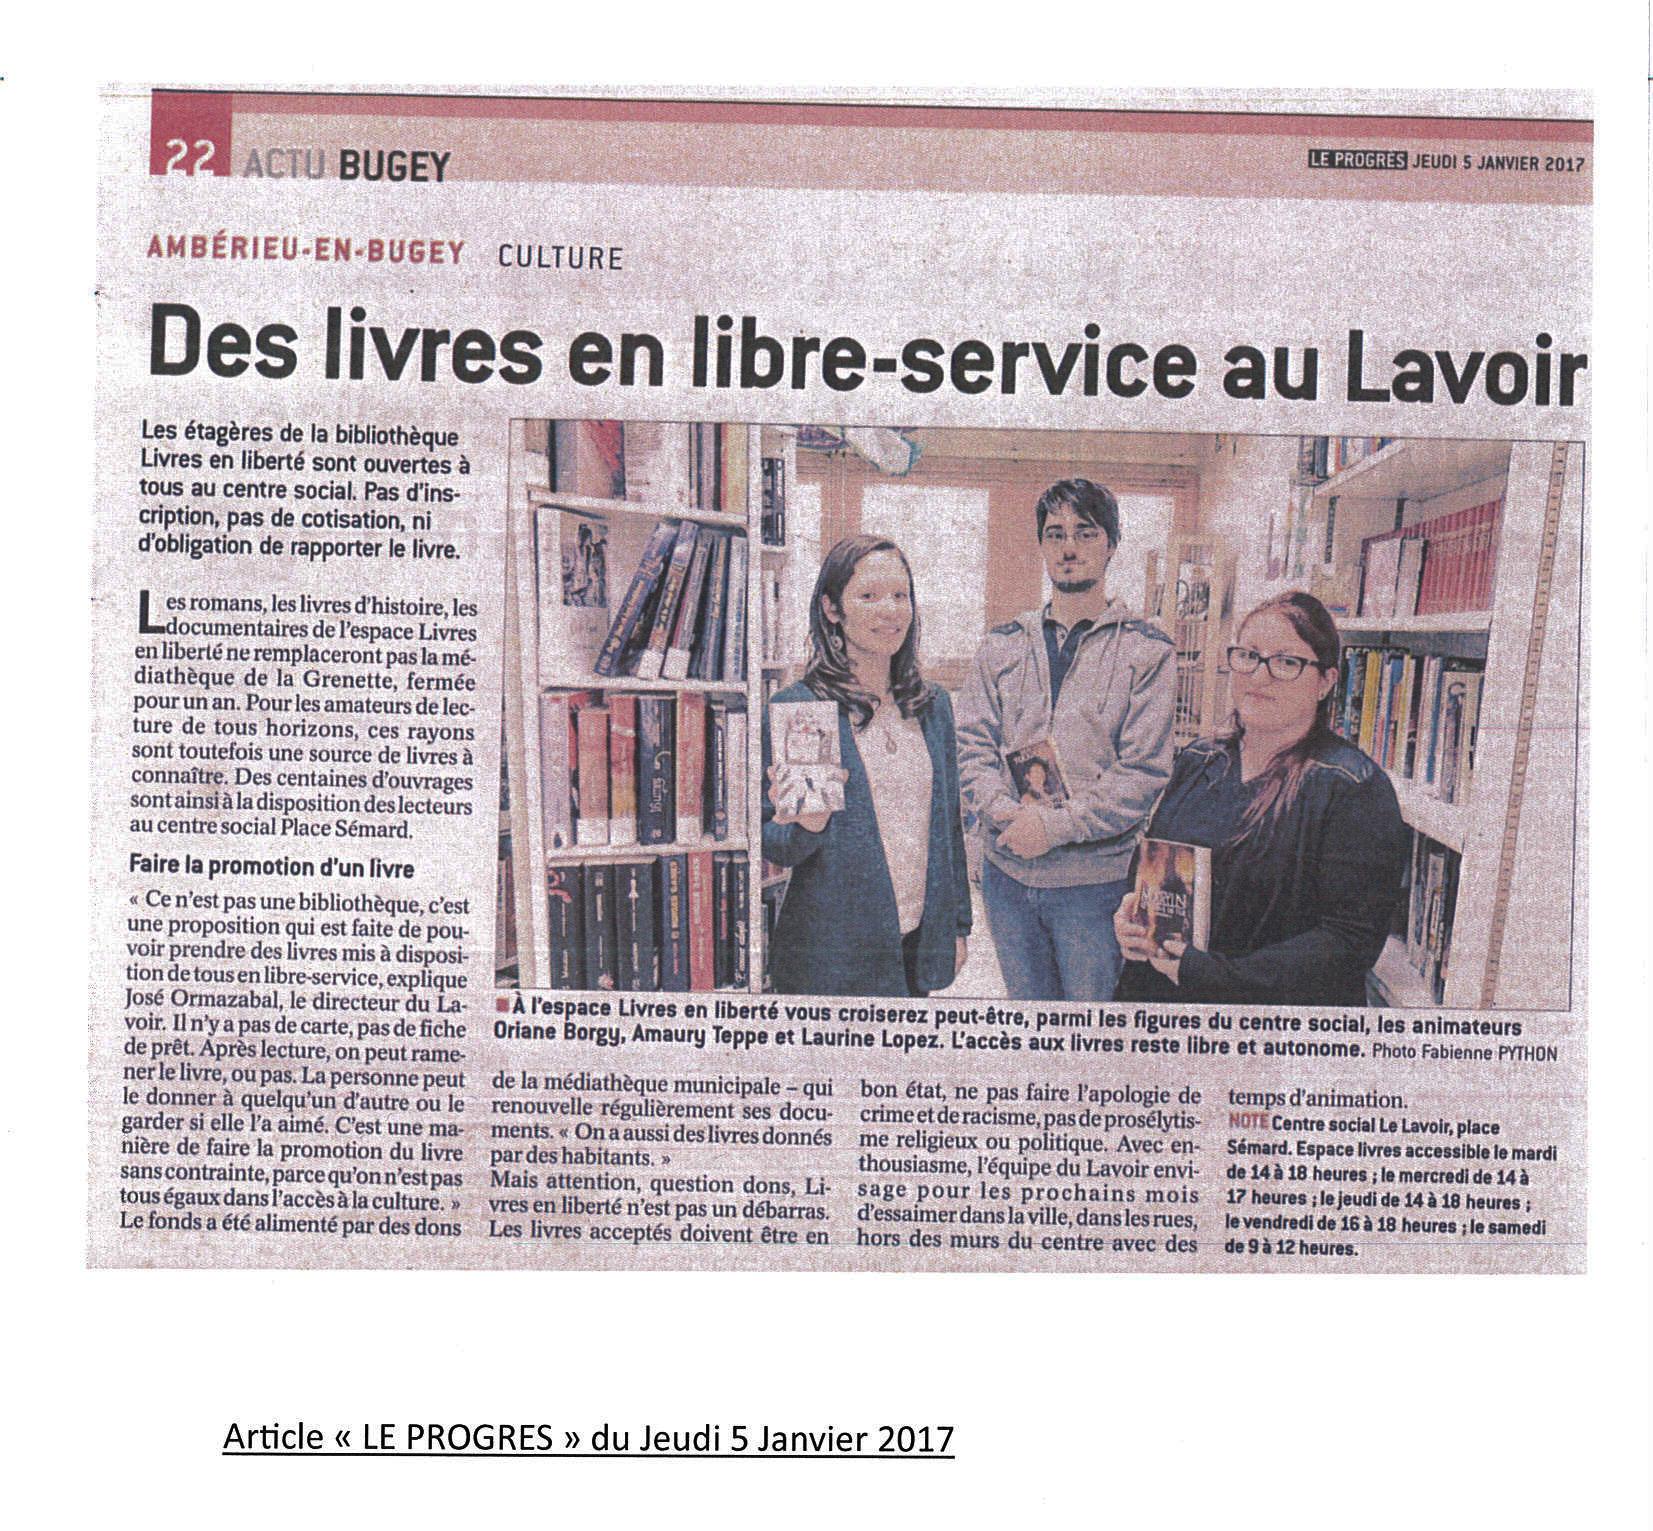 bibliotheque-en-liberte-article-du-5-janvier-2017